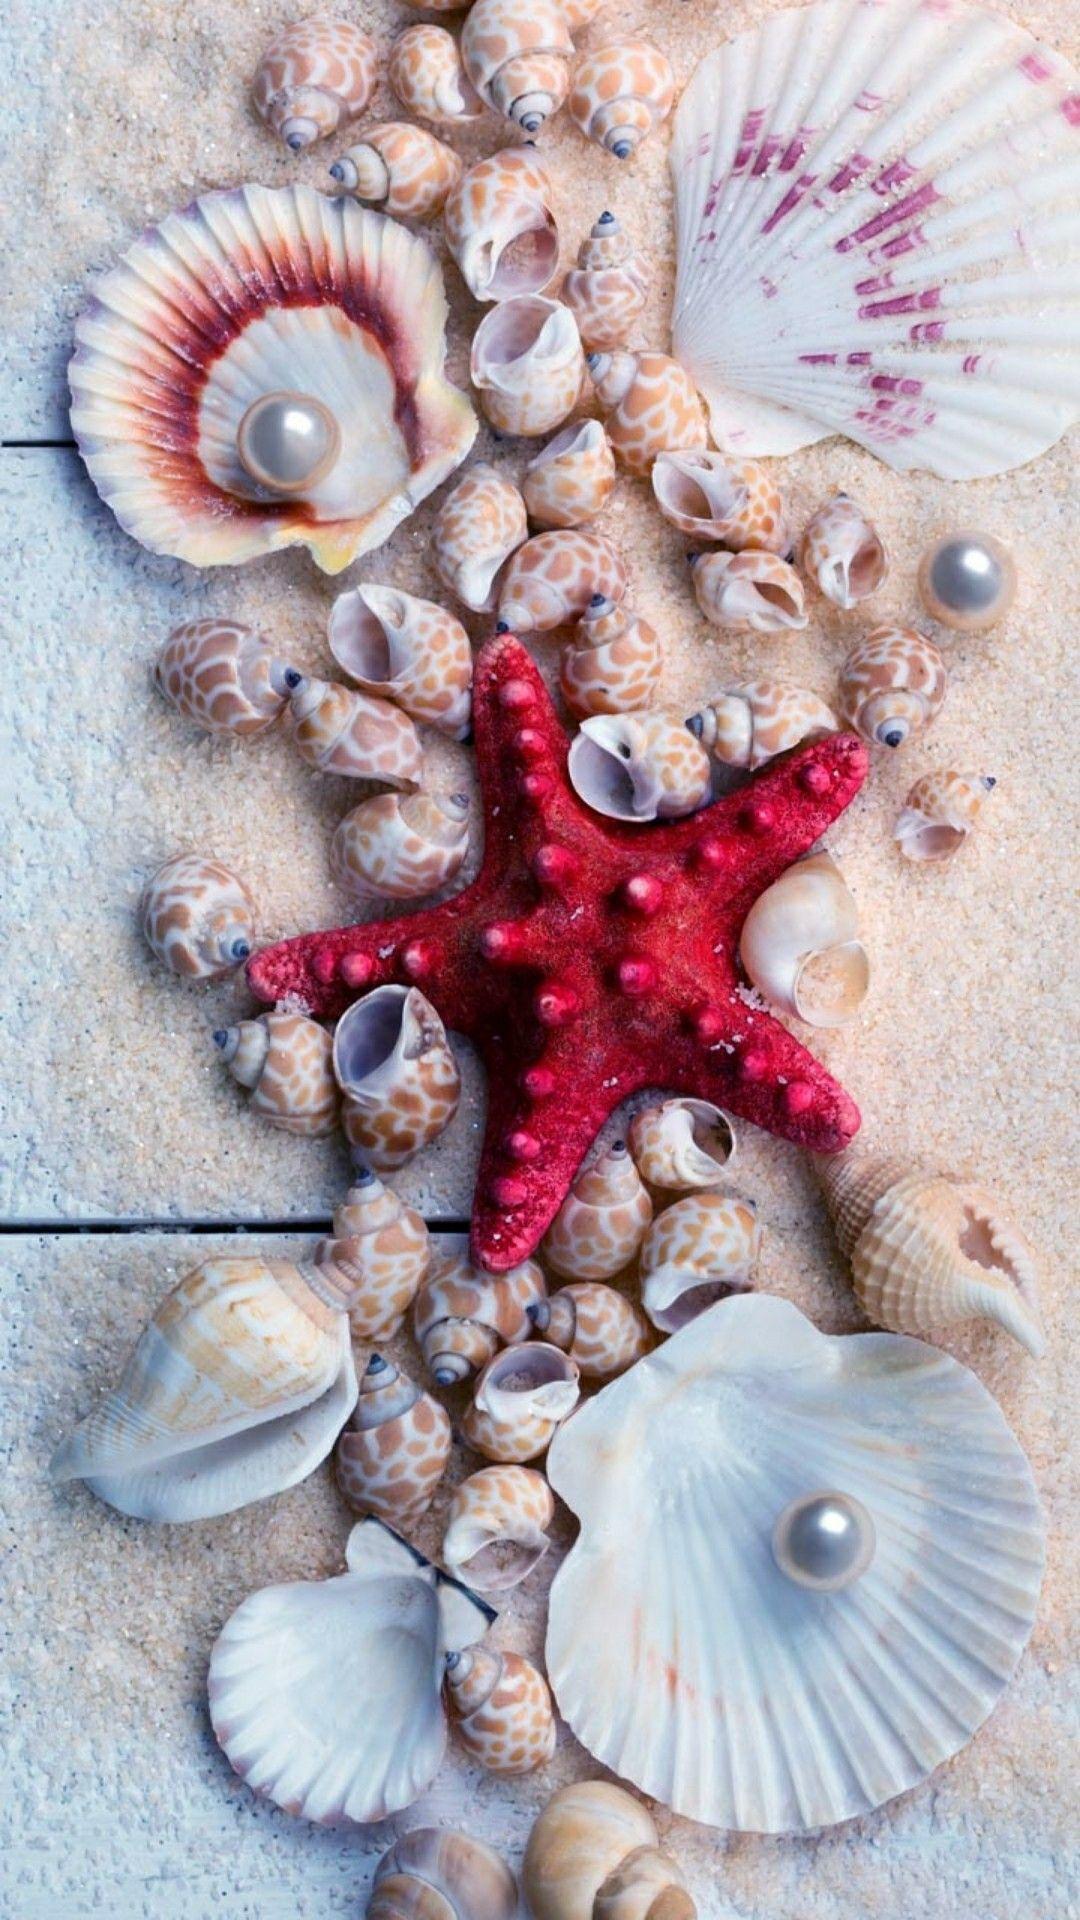 Pin By Marion Tsai On Seashells Summer Wallpaper Flower Background Wallpaper Ocean Wallpaper